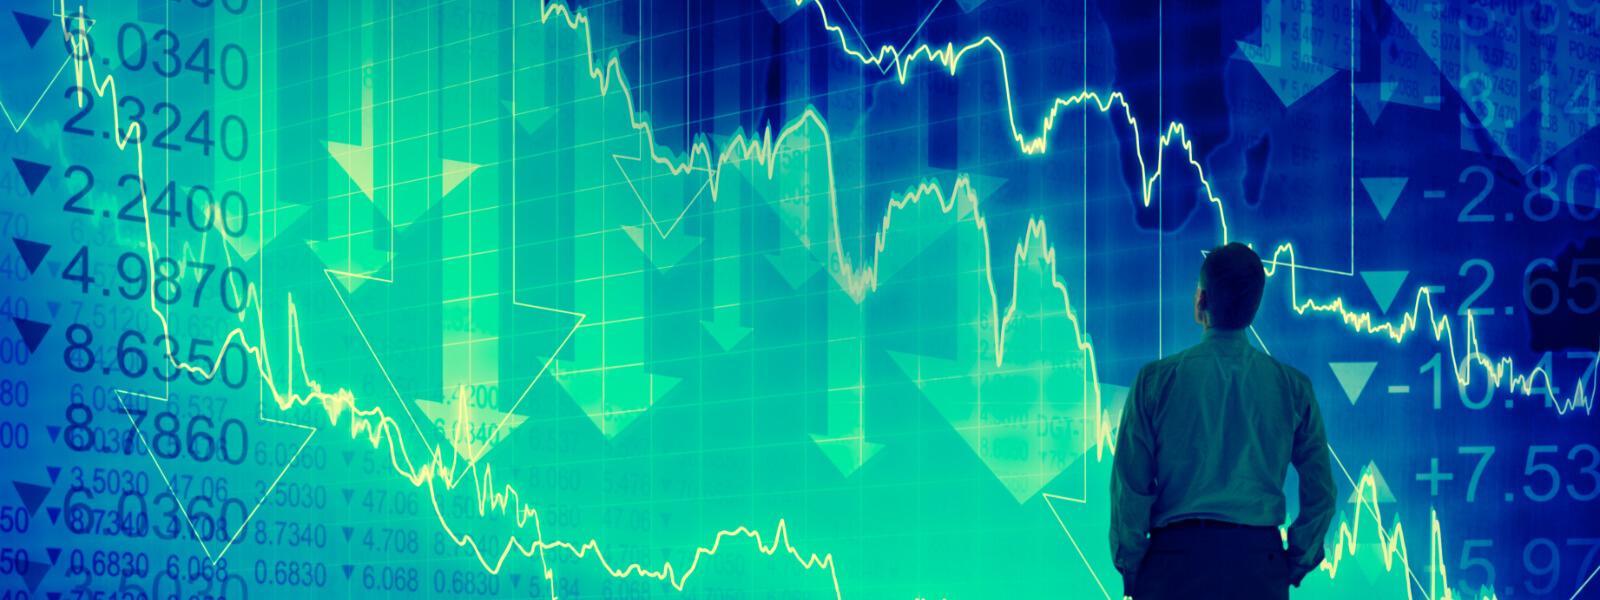 Markets-Taking-A-Hit